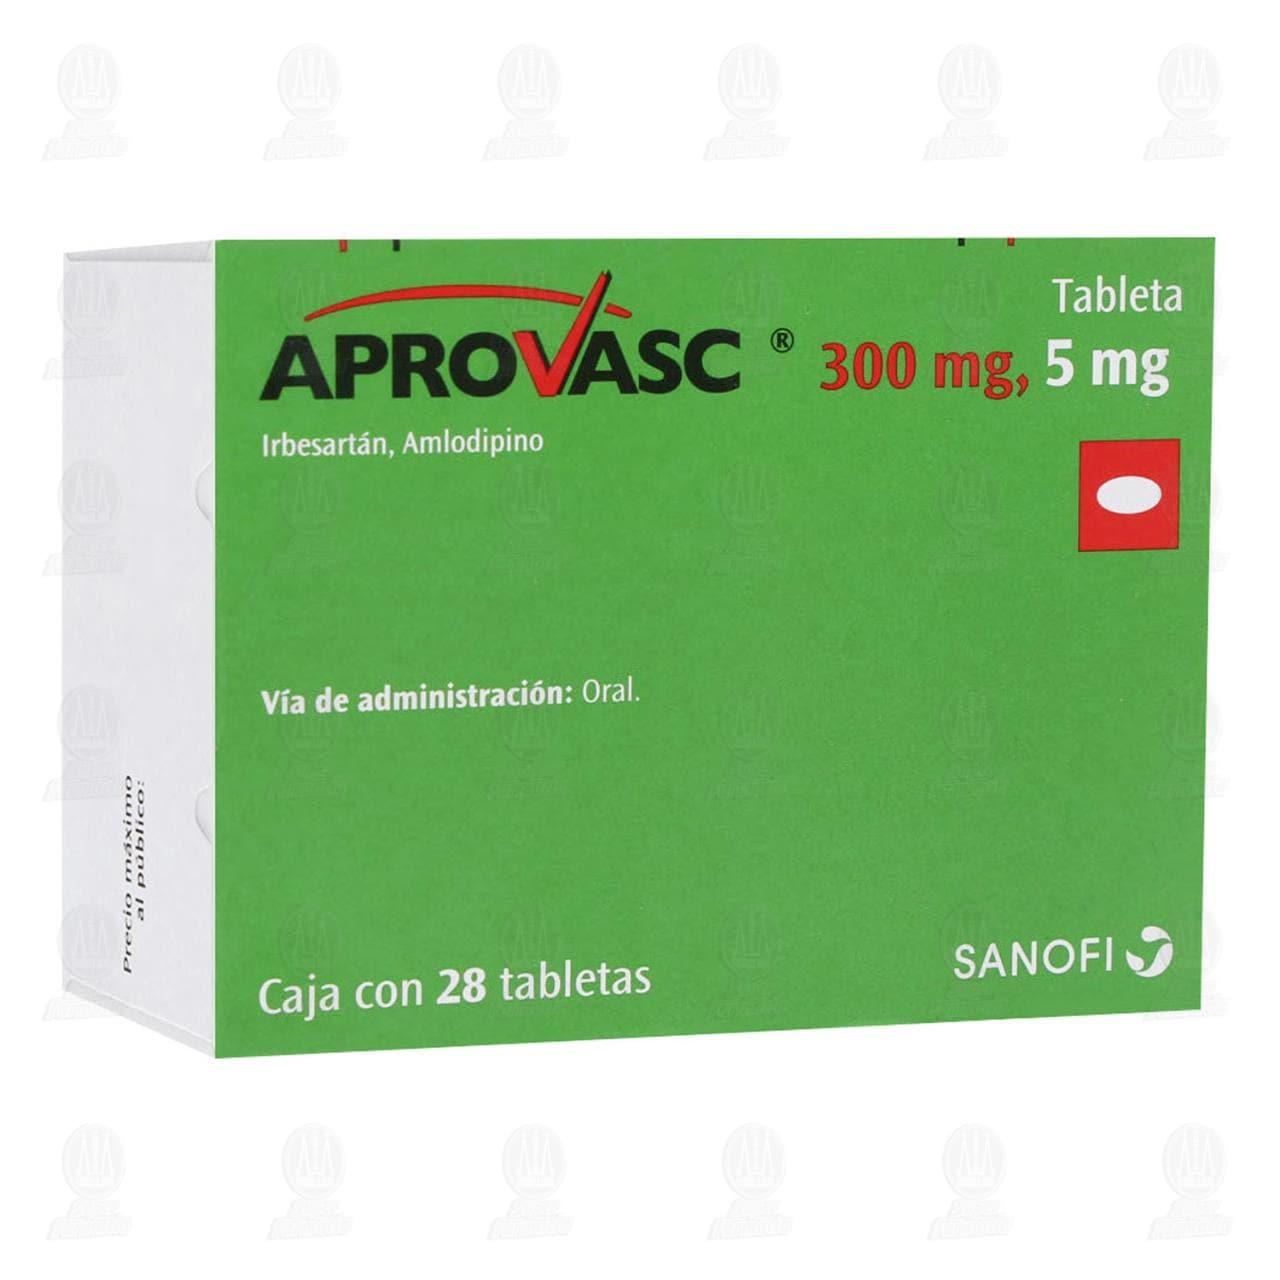 Comprar Aprovasc 300mg/5mg 28 Tabletas en Farmacias Guadalajara